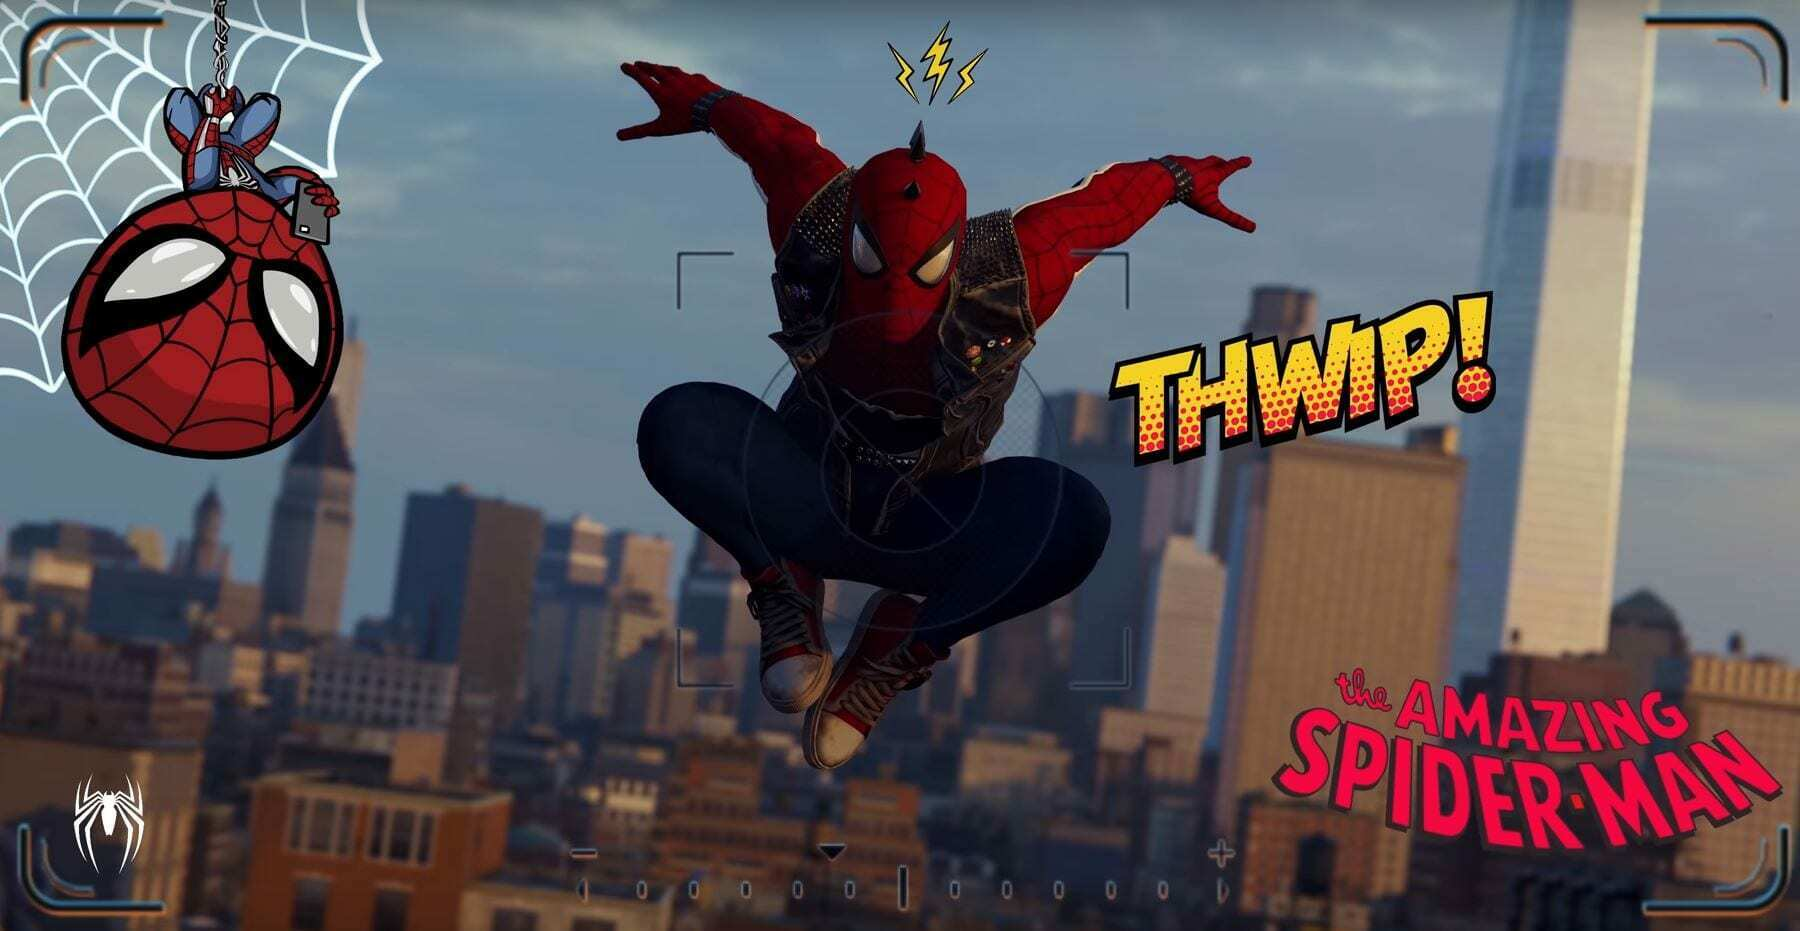 Spiderman Photo Mode